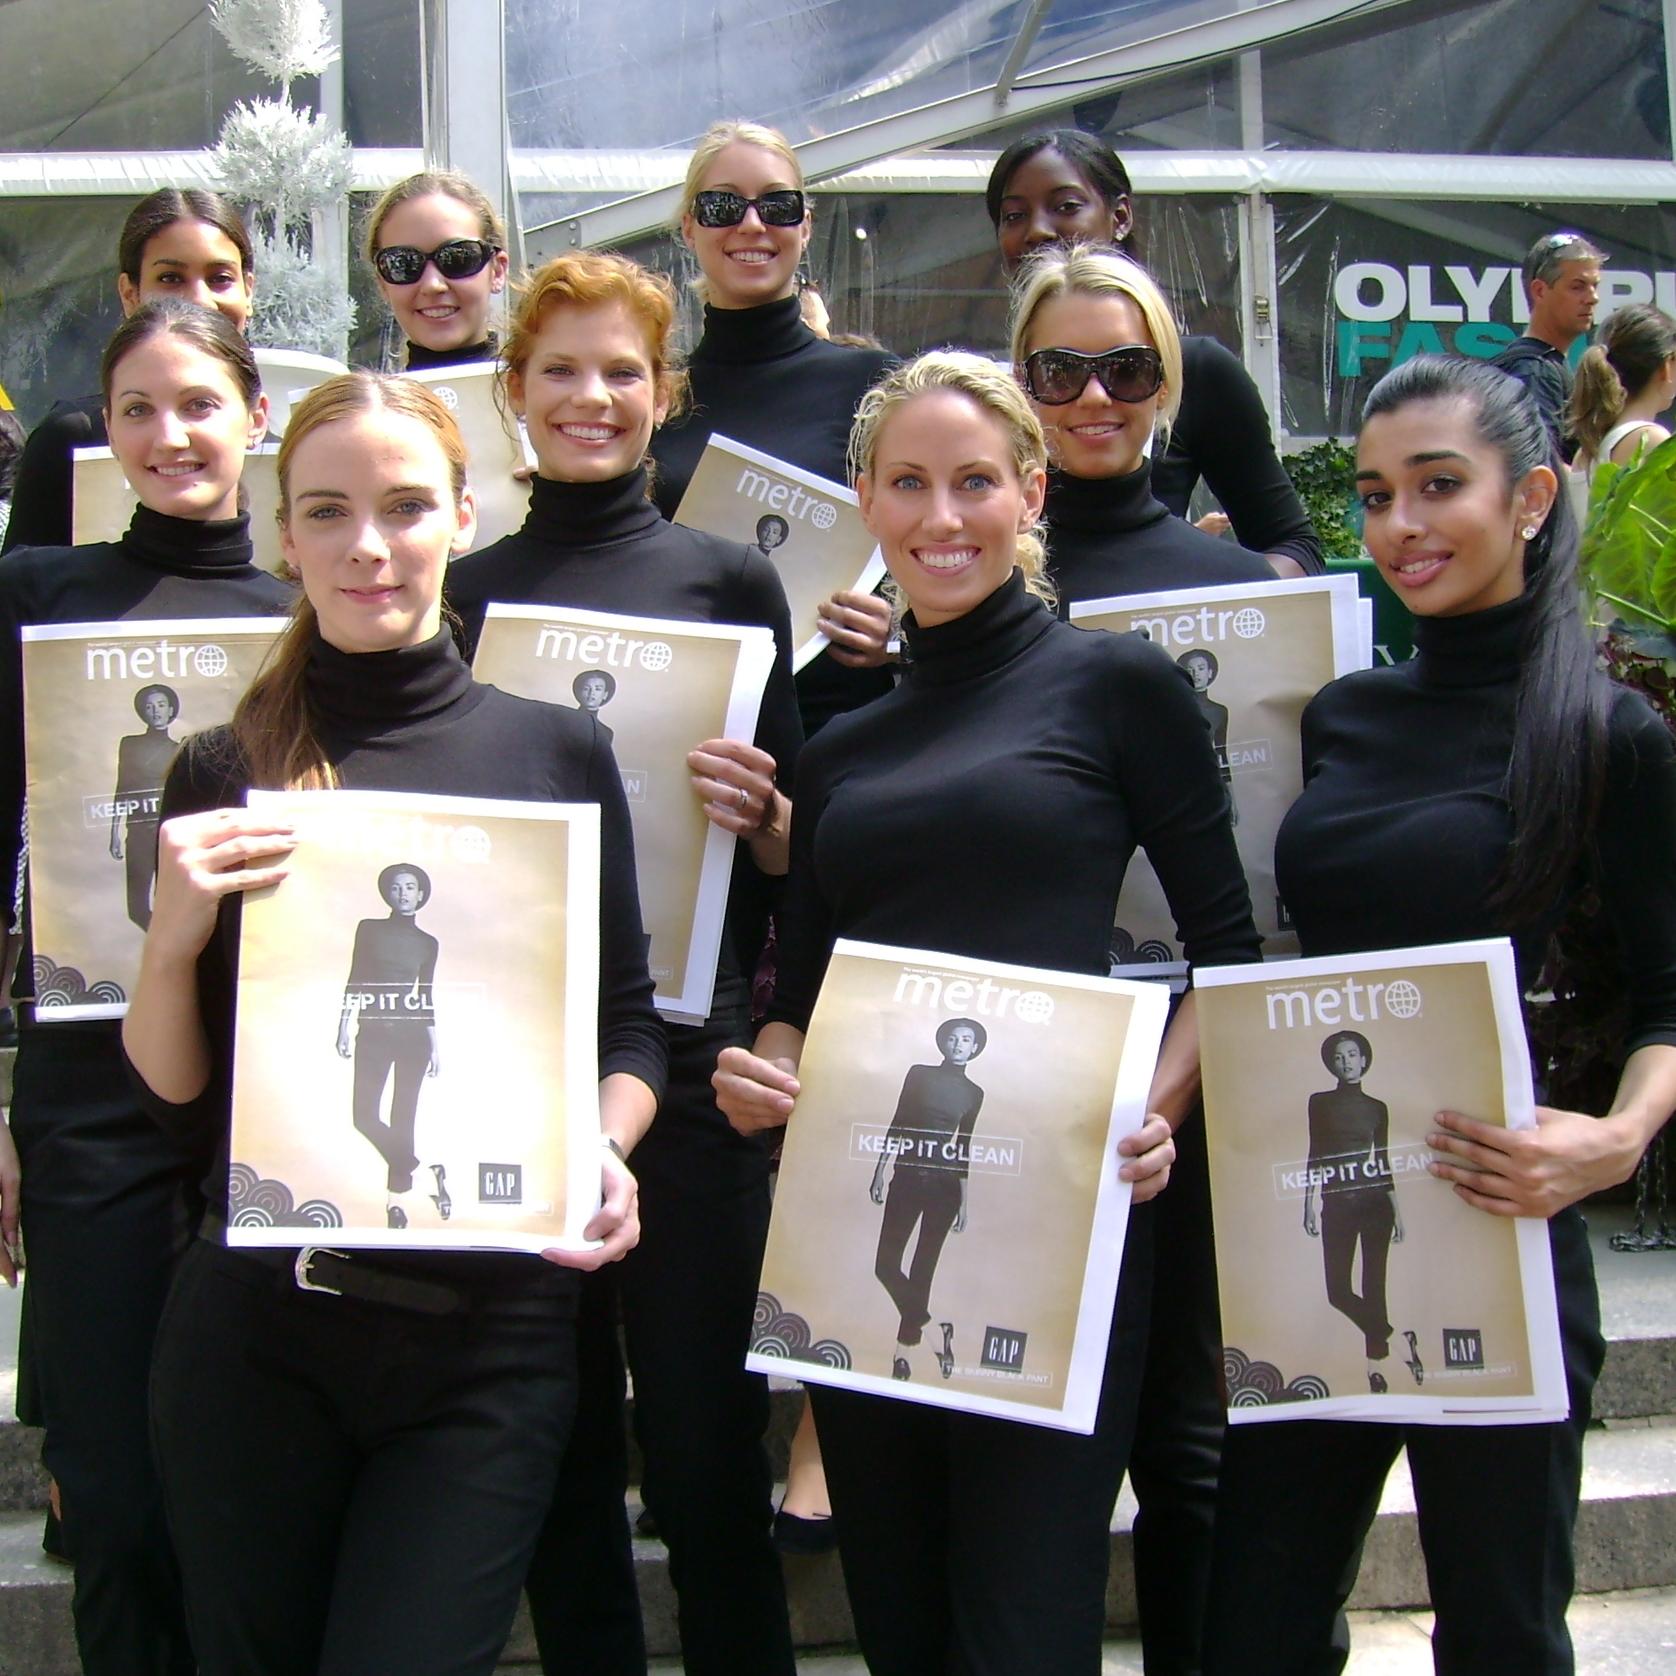 Attractive Street team Brand Ambassadors